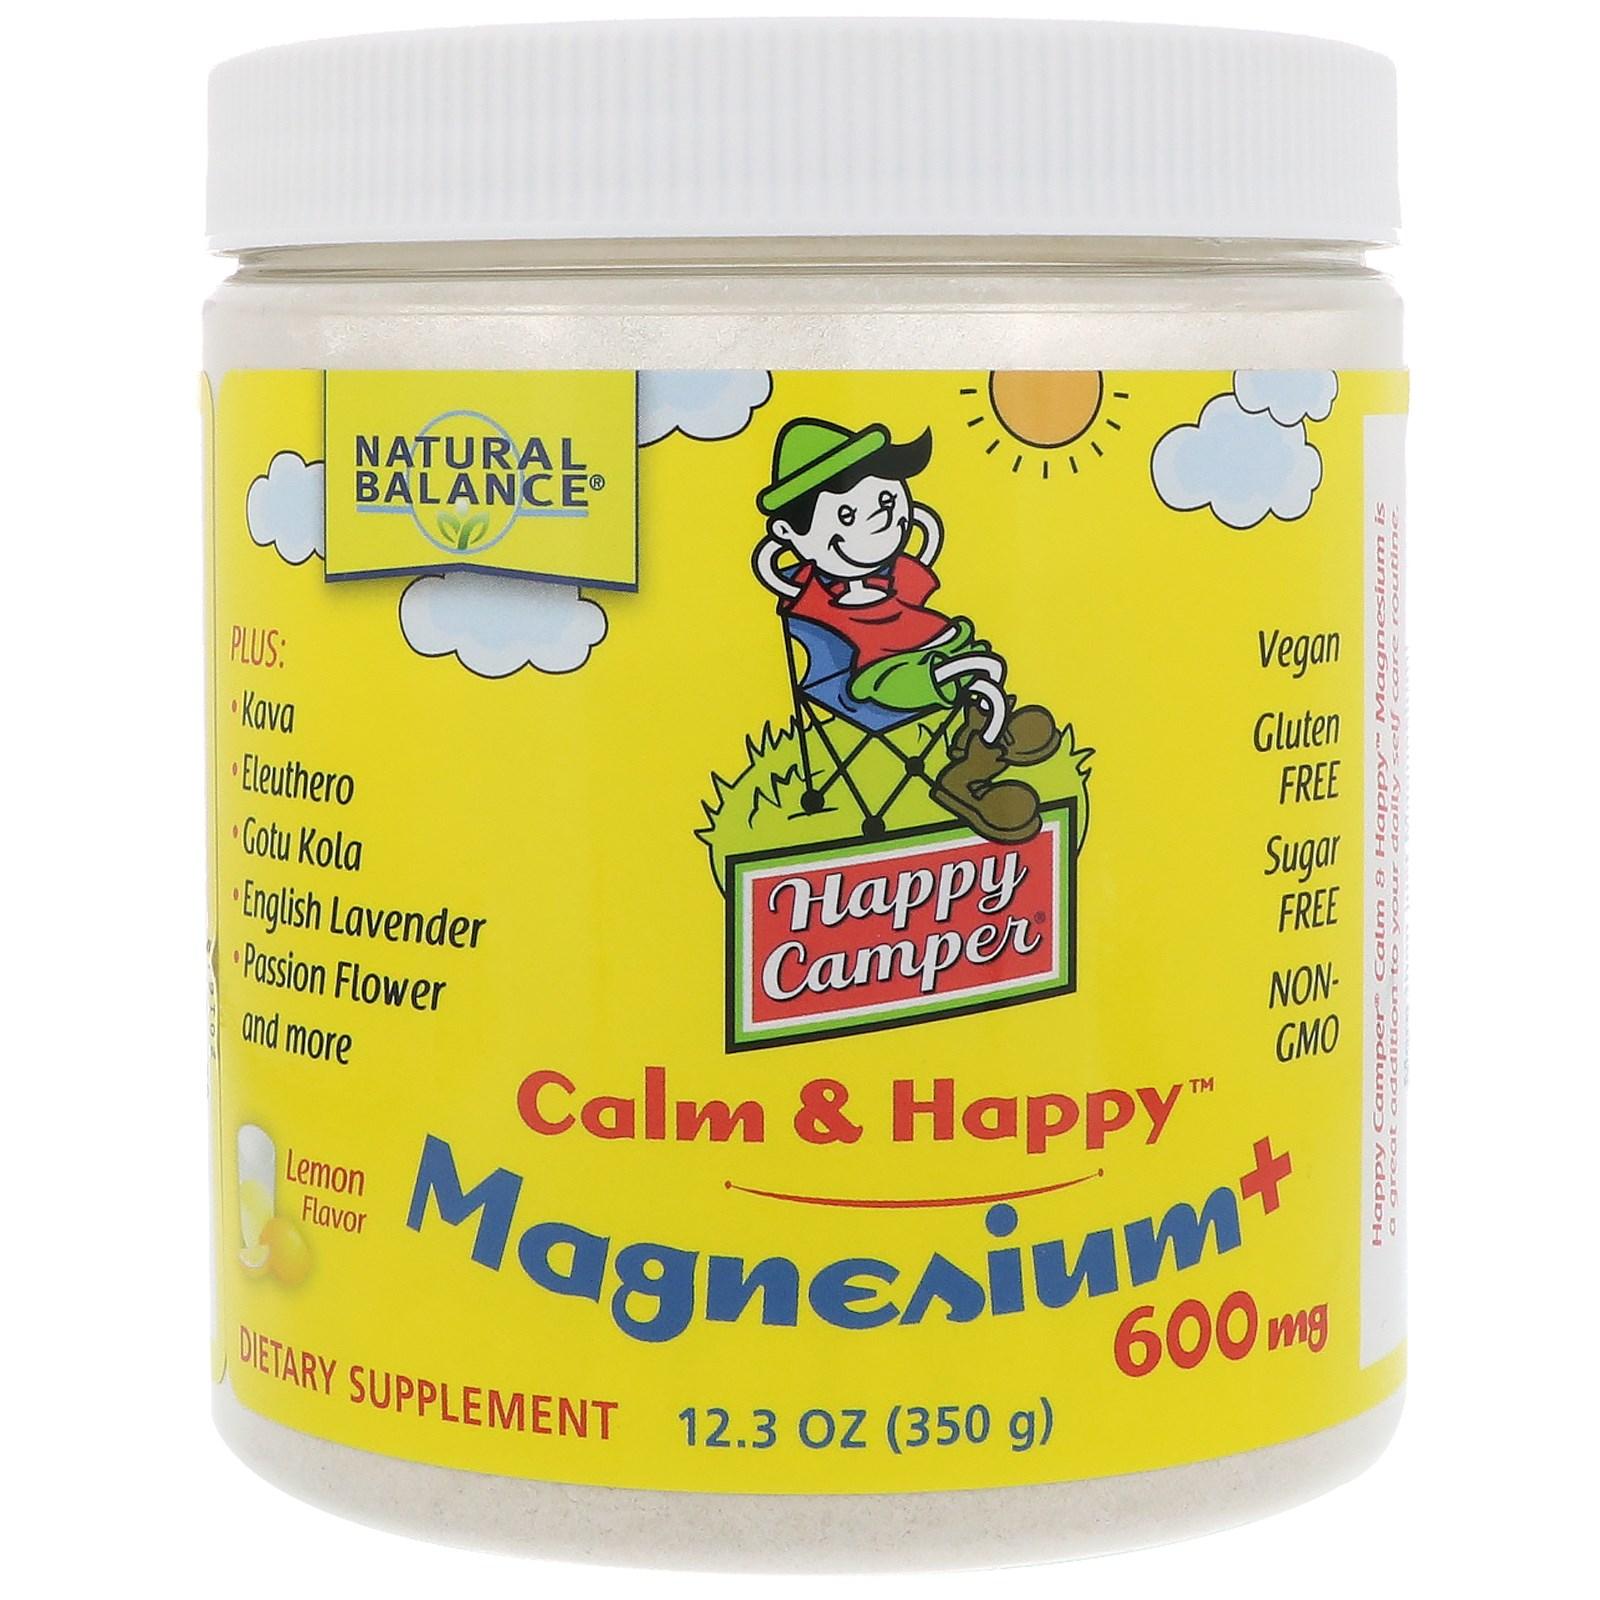 Natural Balance, Happy Camper Calm & Happy Magnesium, Lemon, 600 mg, 12.3 oz (350 g)